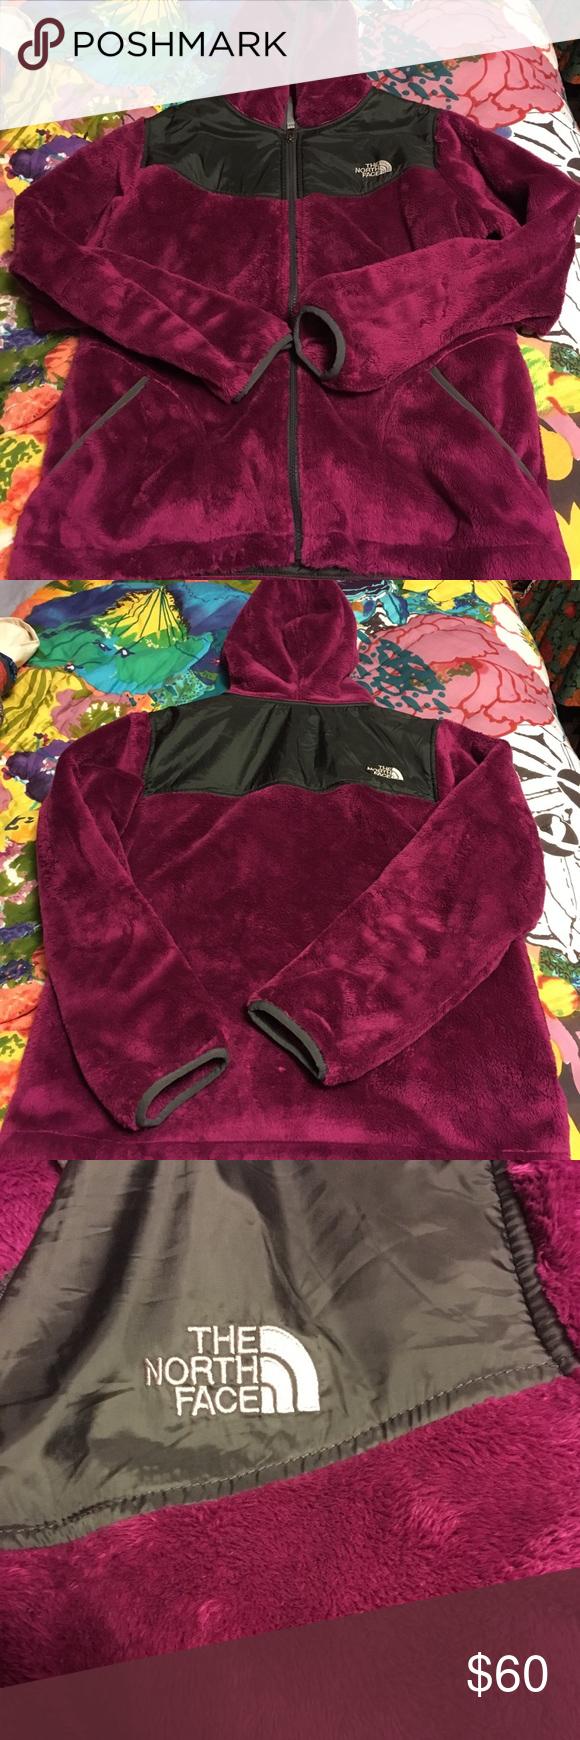 North face fleece jacket north face fleece jacket face and sweatshirt